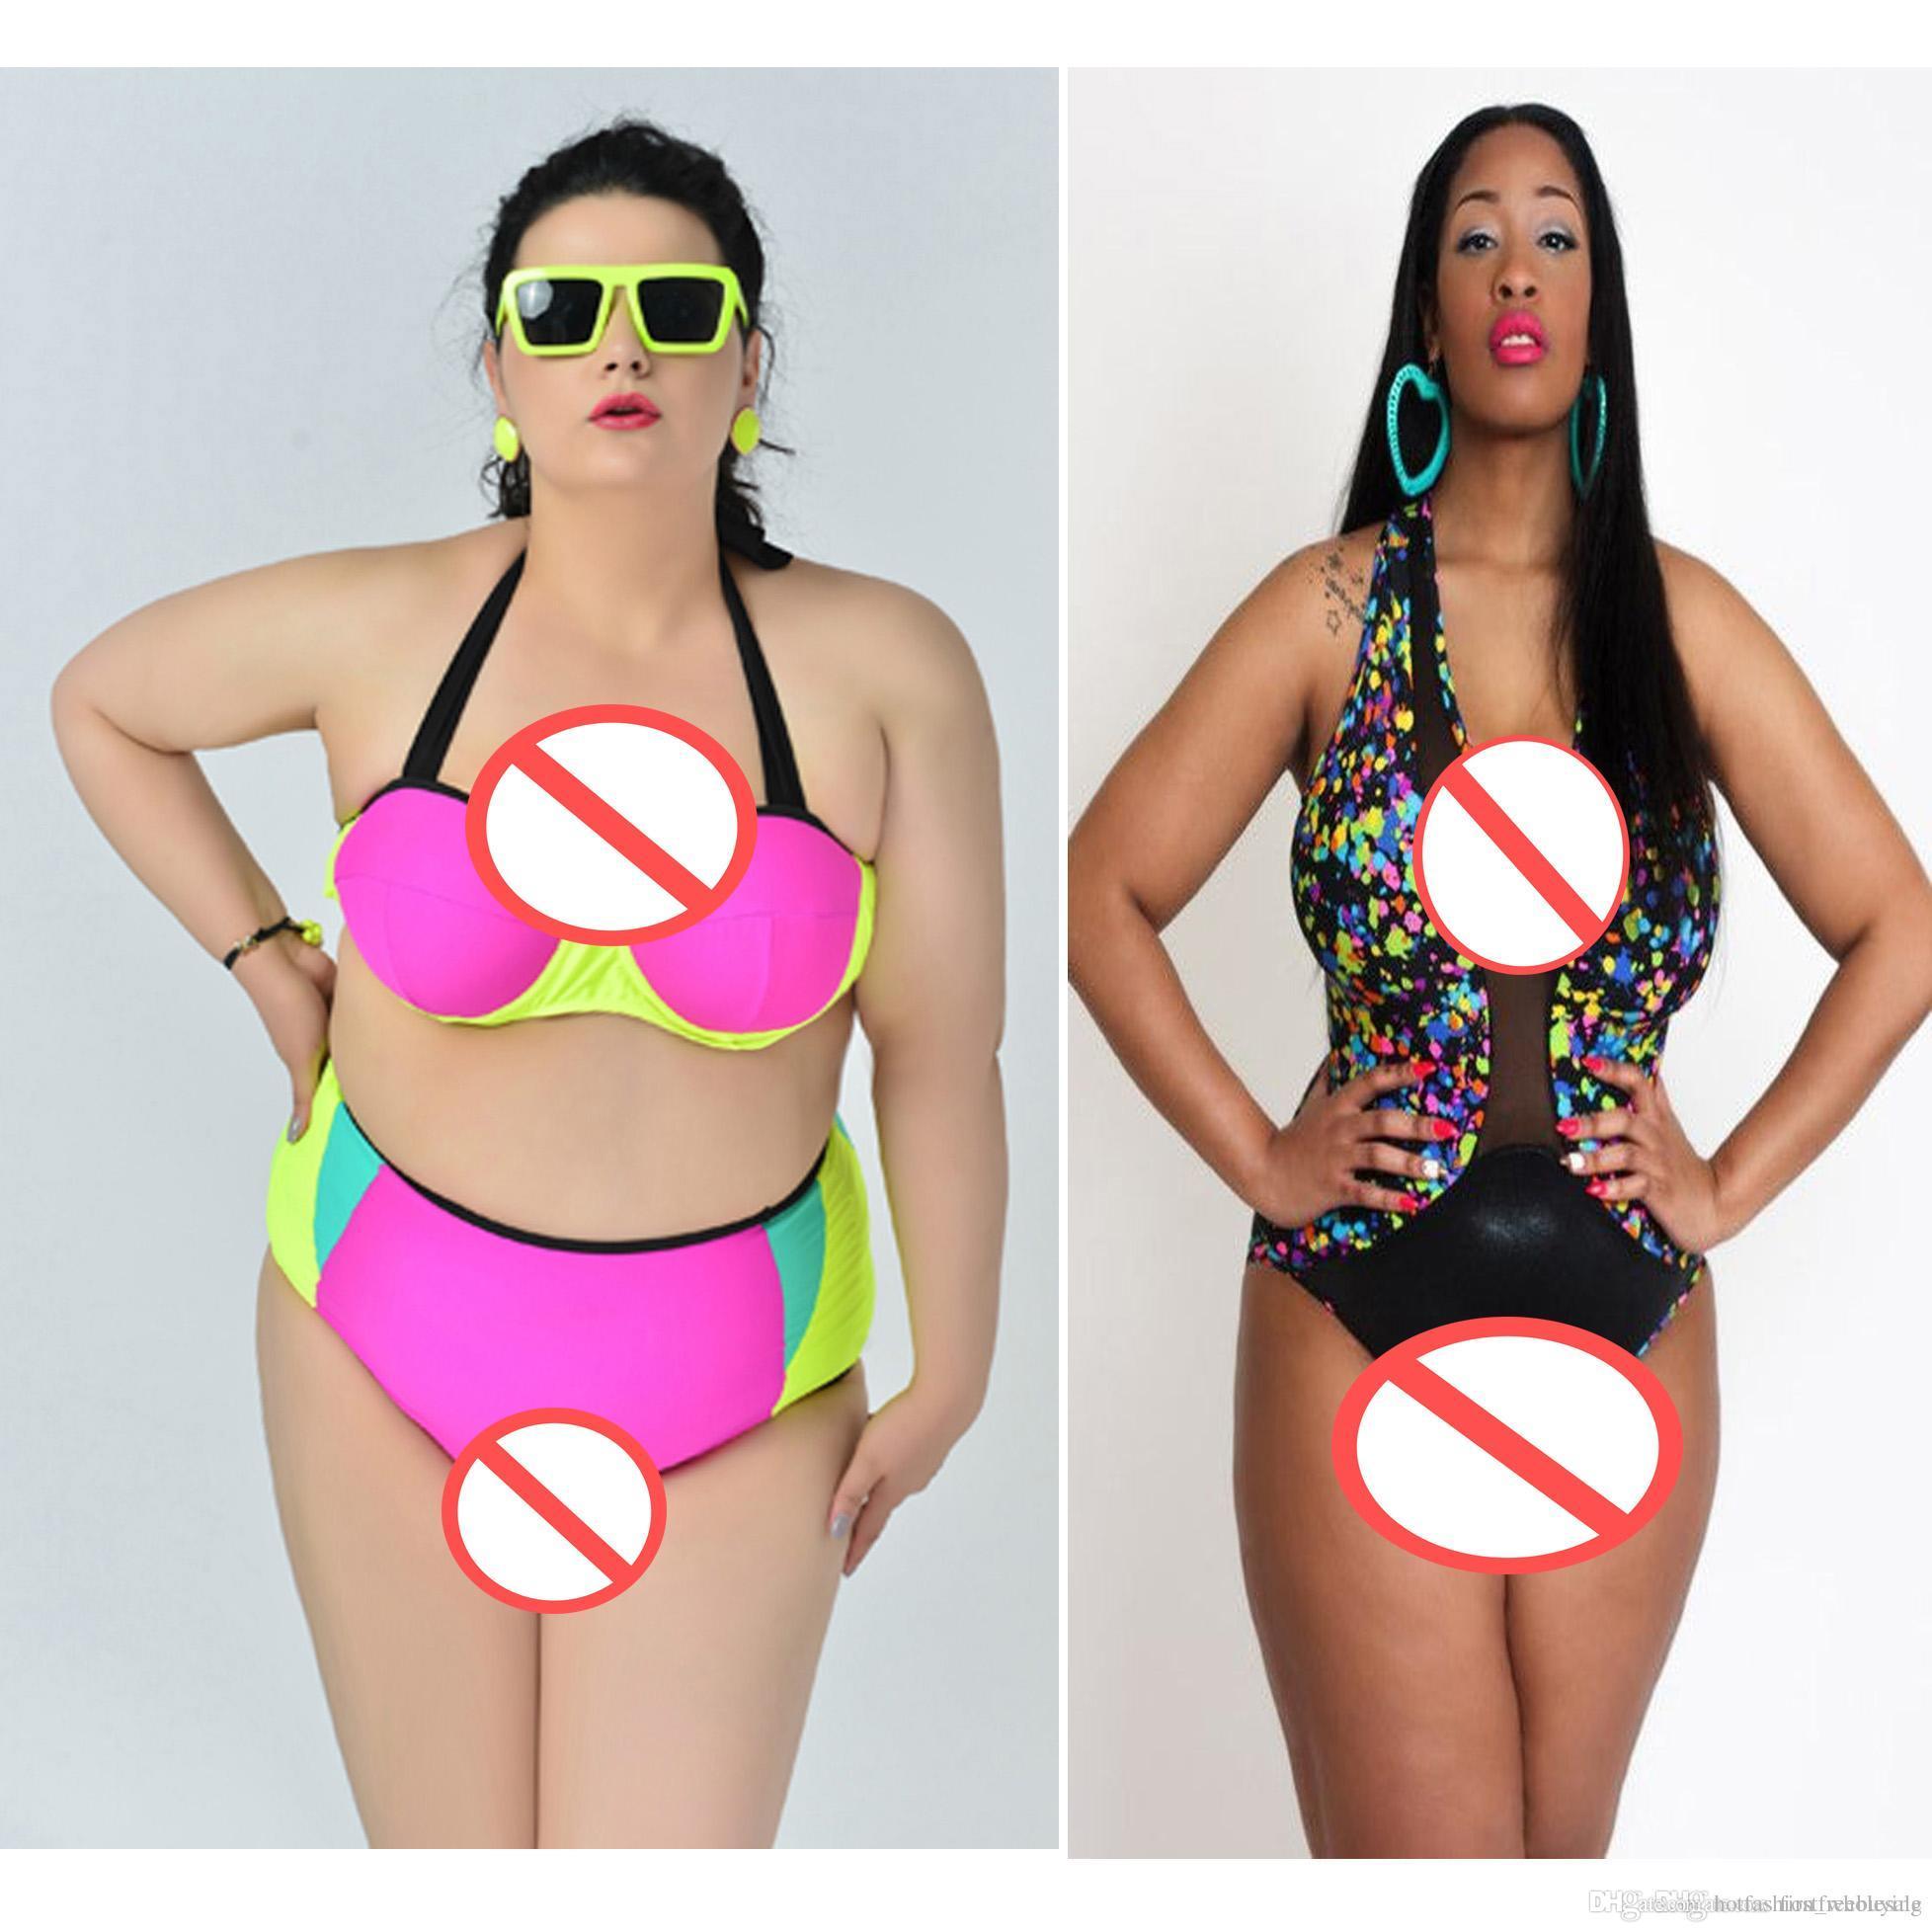 de8355ffa8e74 Großhandel Fat Damen Bikini Set Push Up Top Schwimmen Sexy Bademode Strand  Tragen Badeanzug Badeanzüge Plus Größe Komfortable Ausschnitt Einteiliger  ...